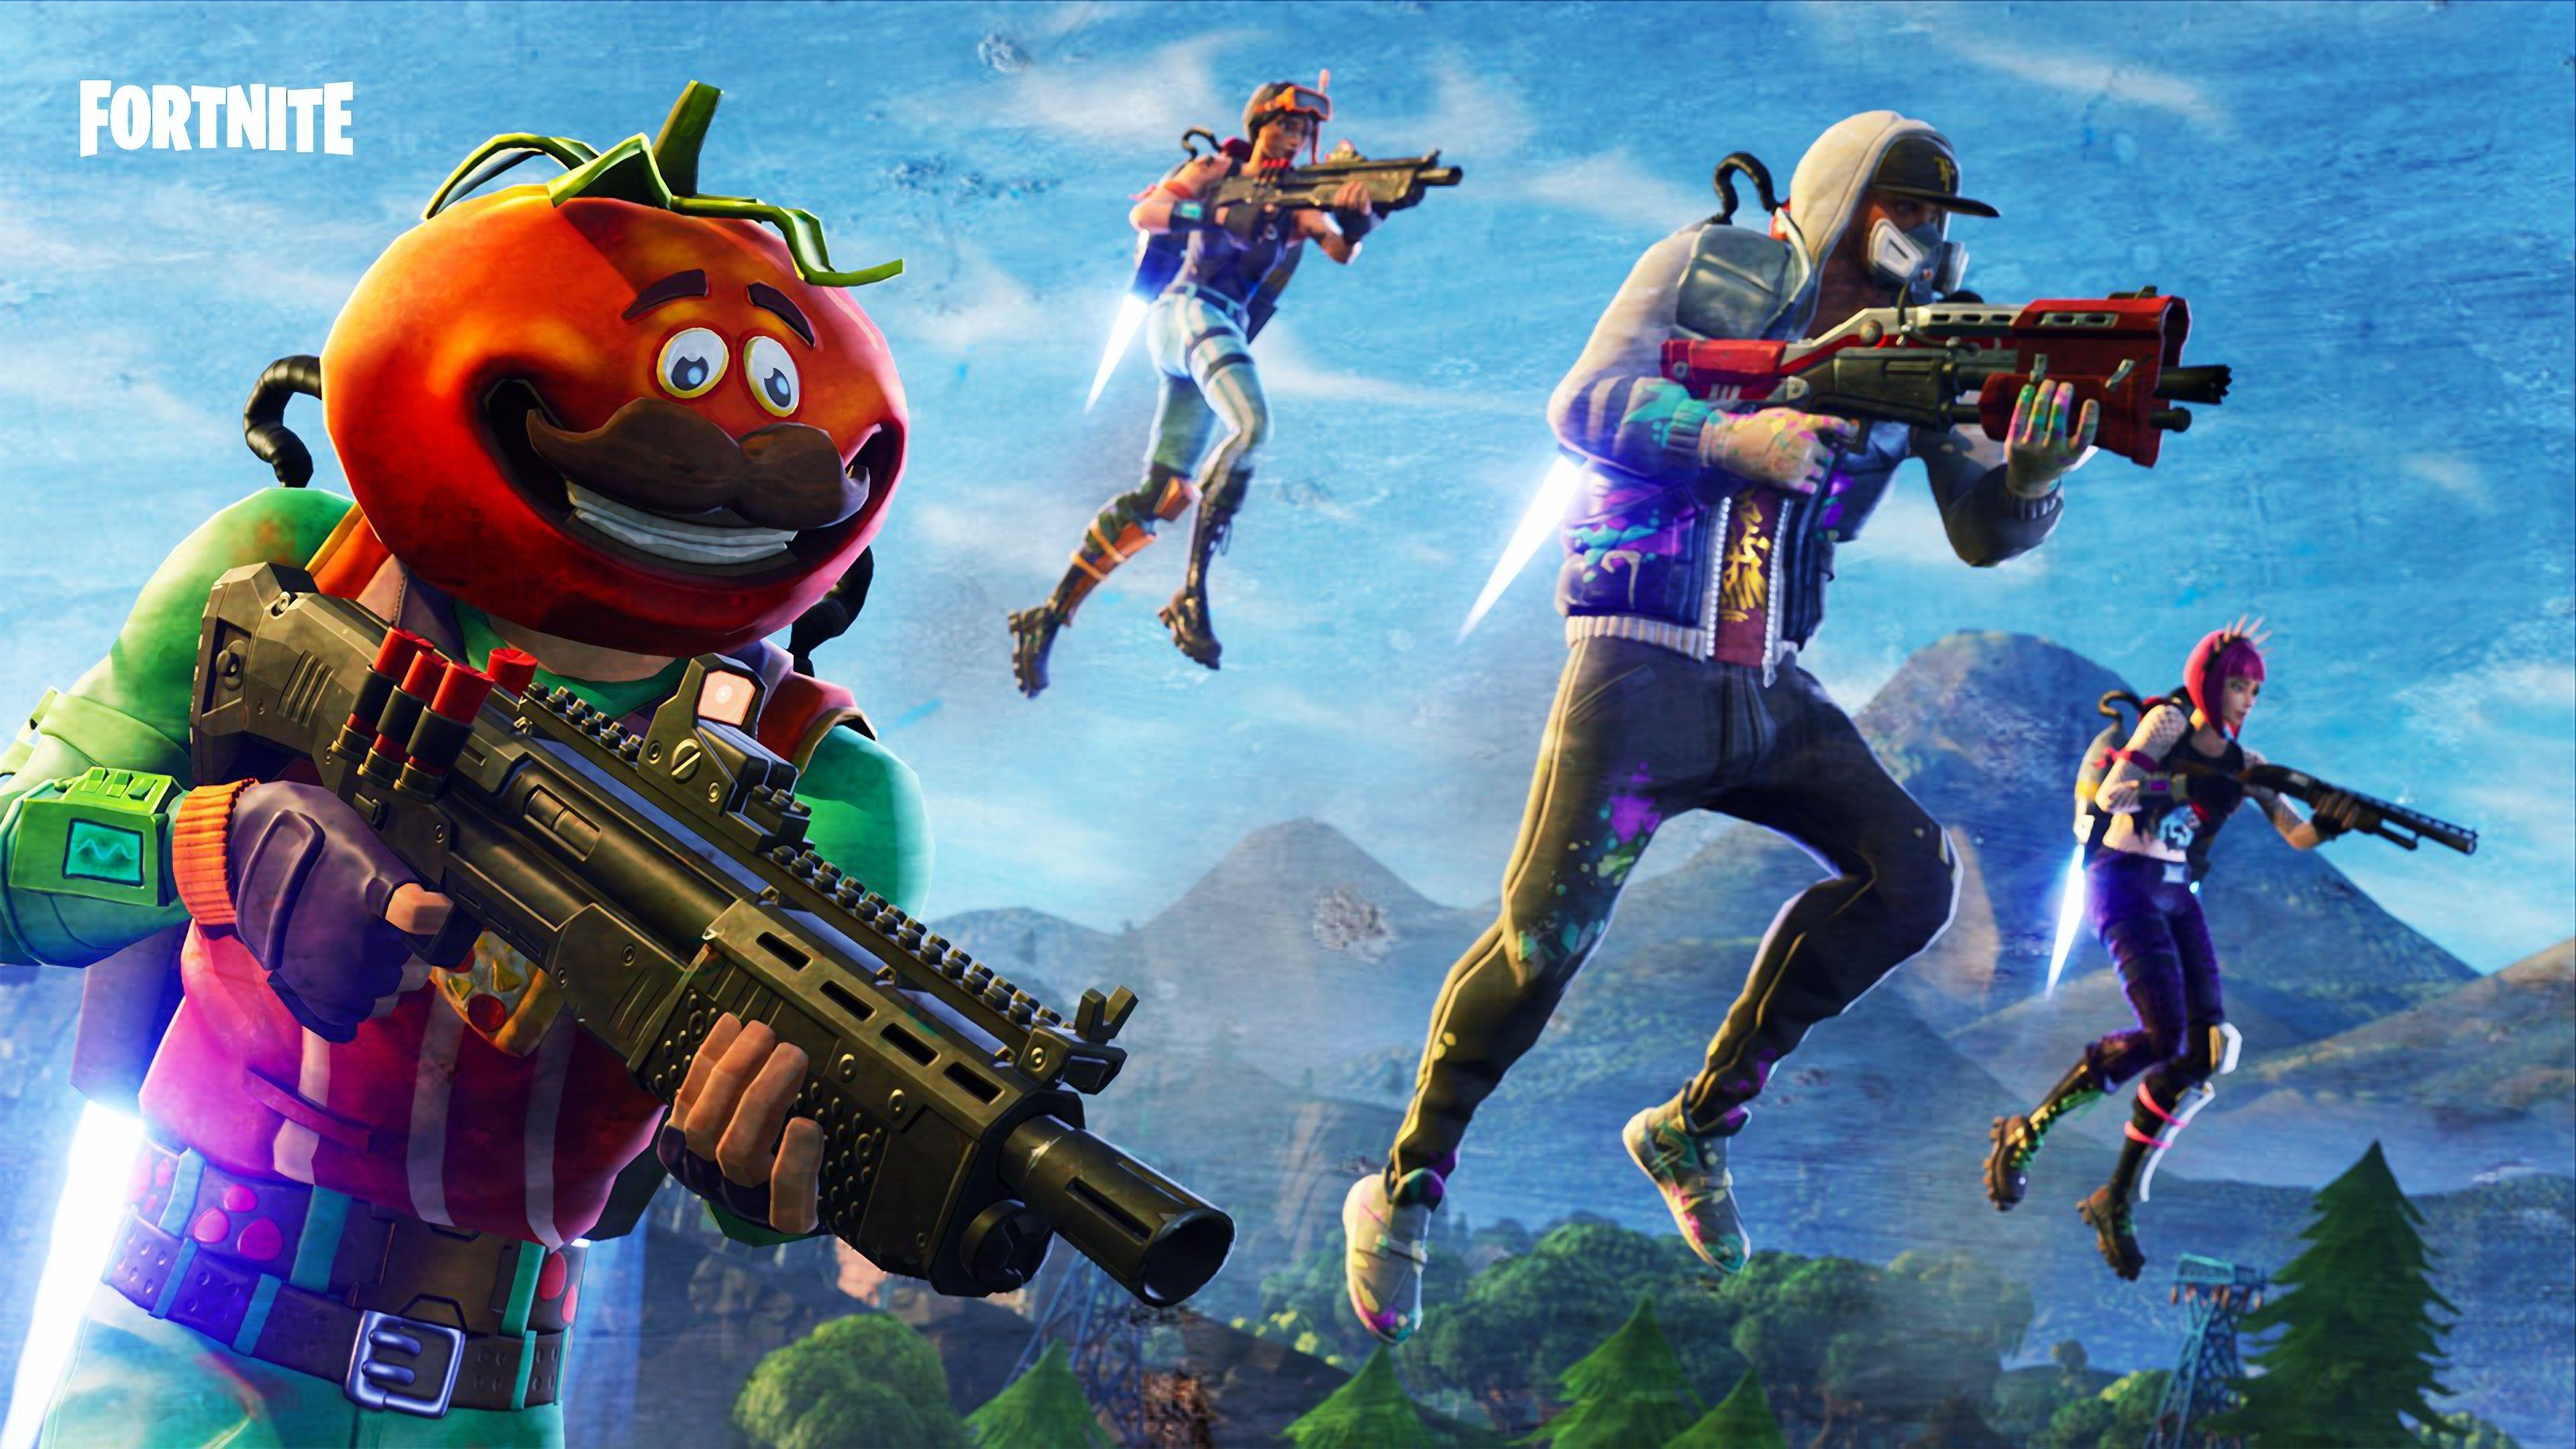 Fortnite Fortnite Playstation Xbox One